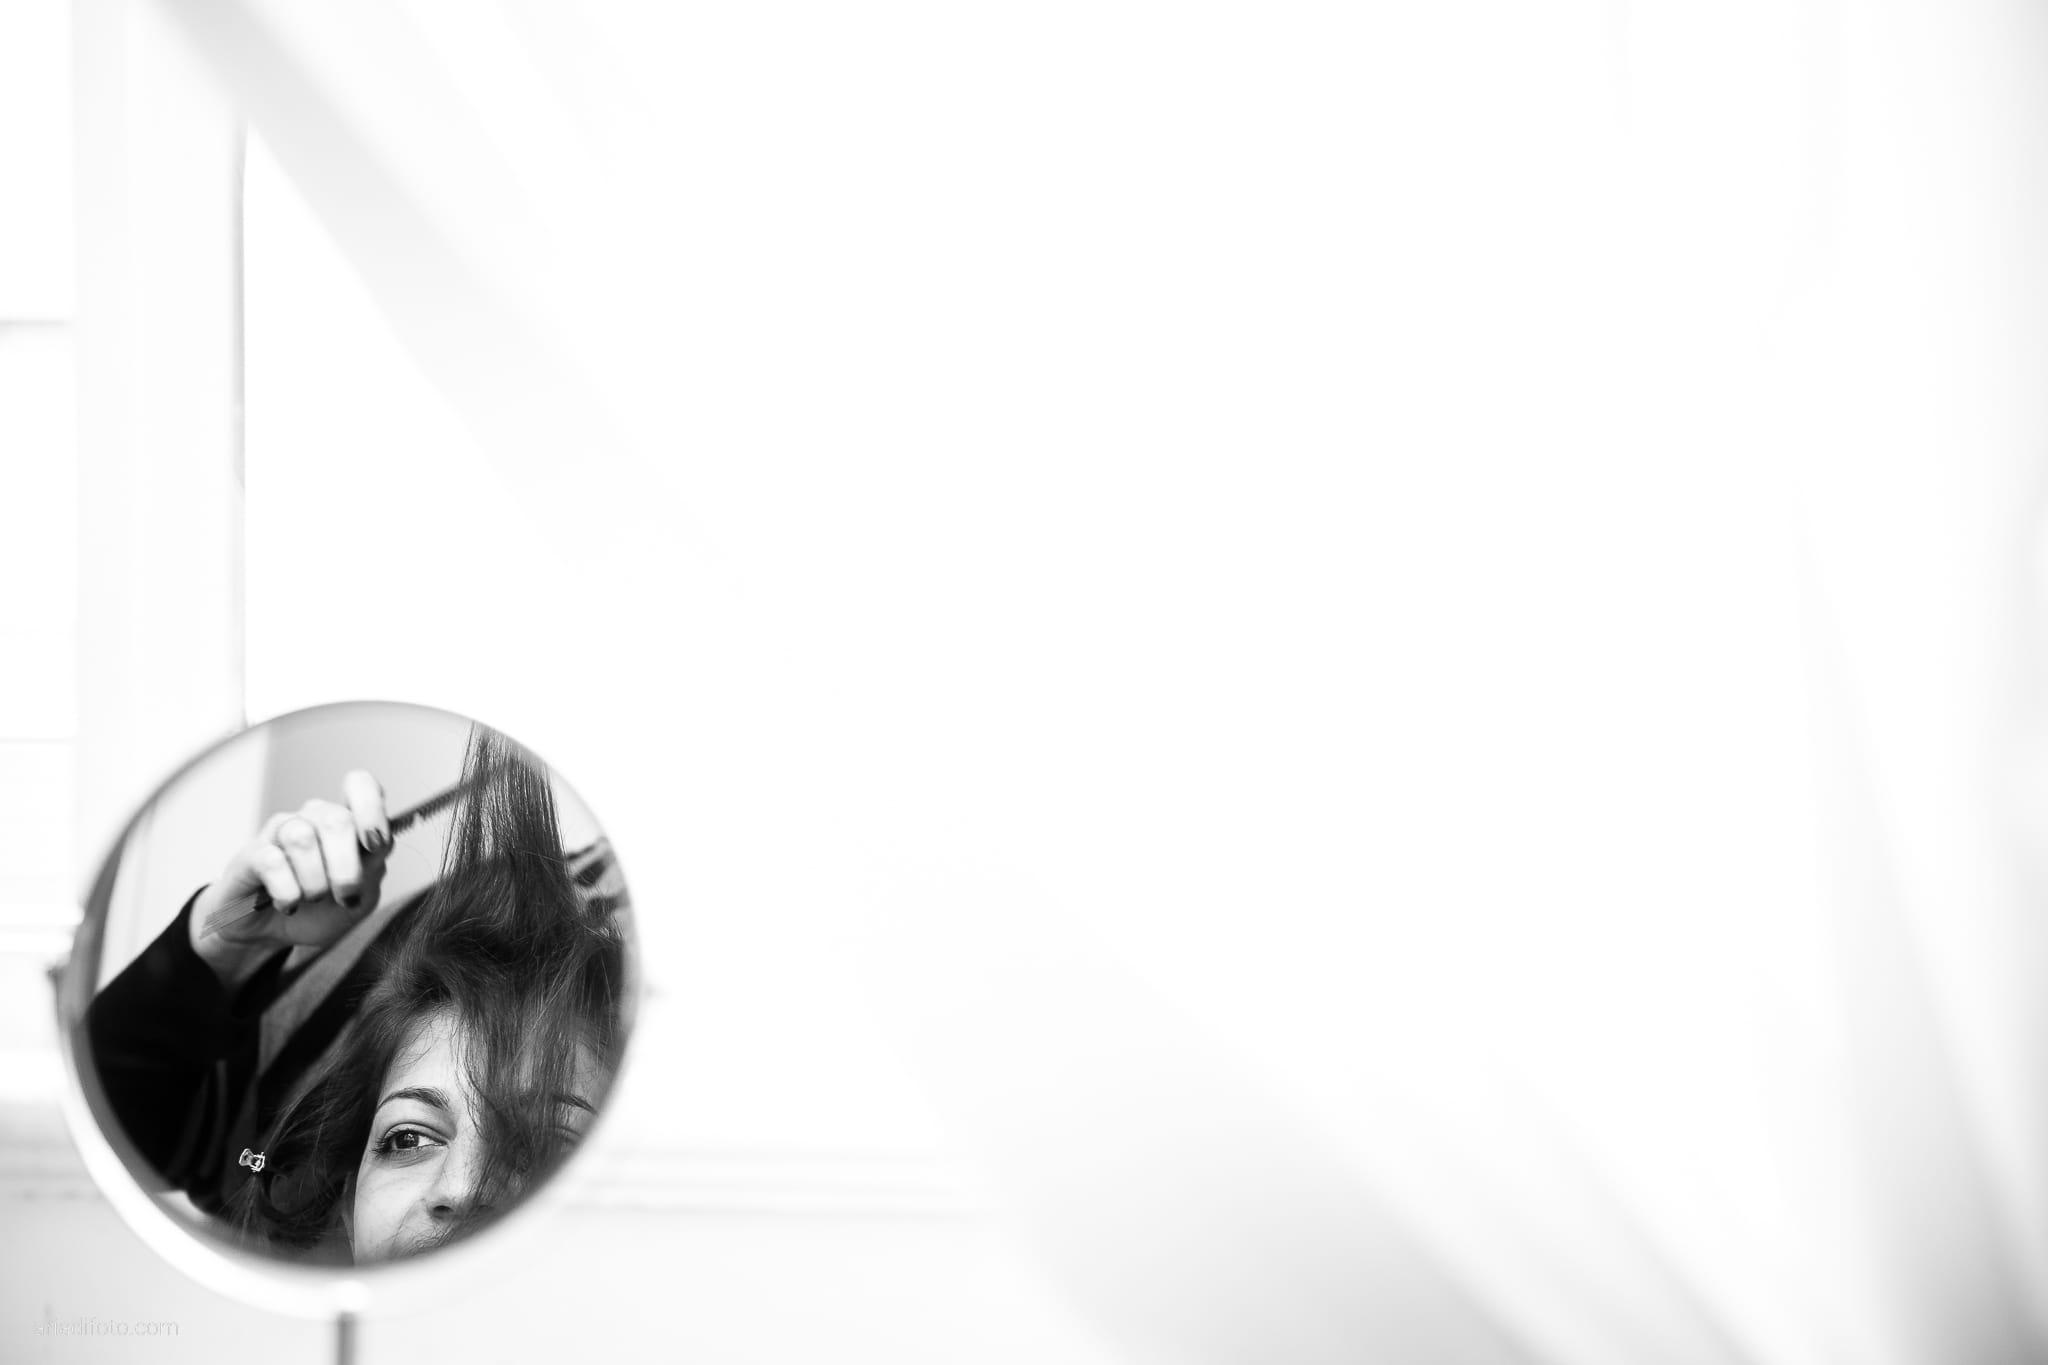 Fiordaliso Andrea matrimonio Salvia Rosmarino Trieste preparativi acconciatura specchio riflesso